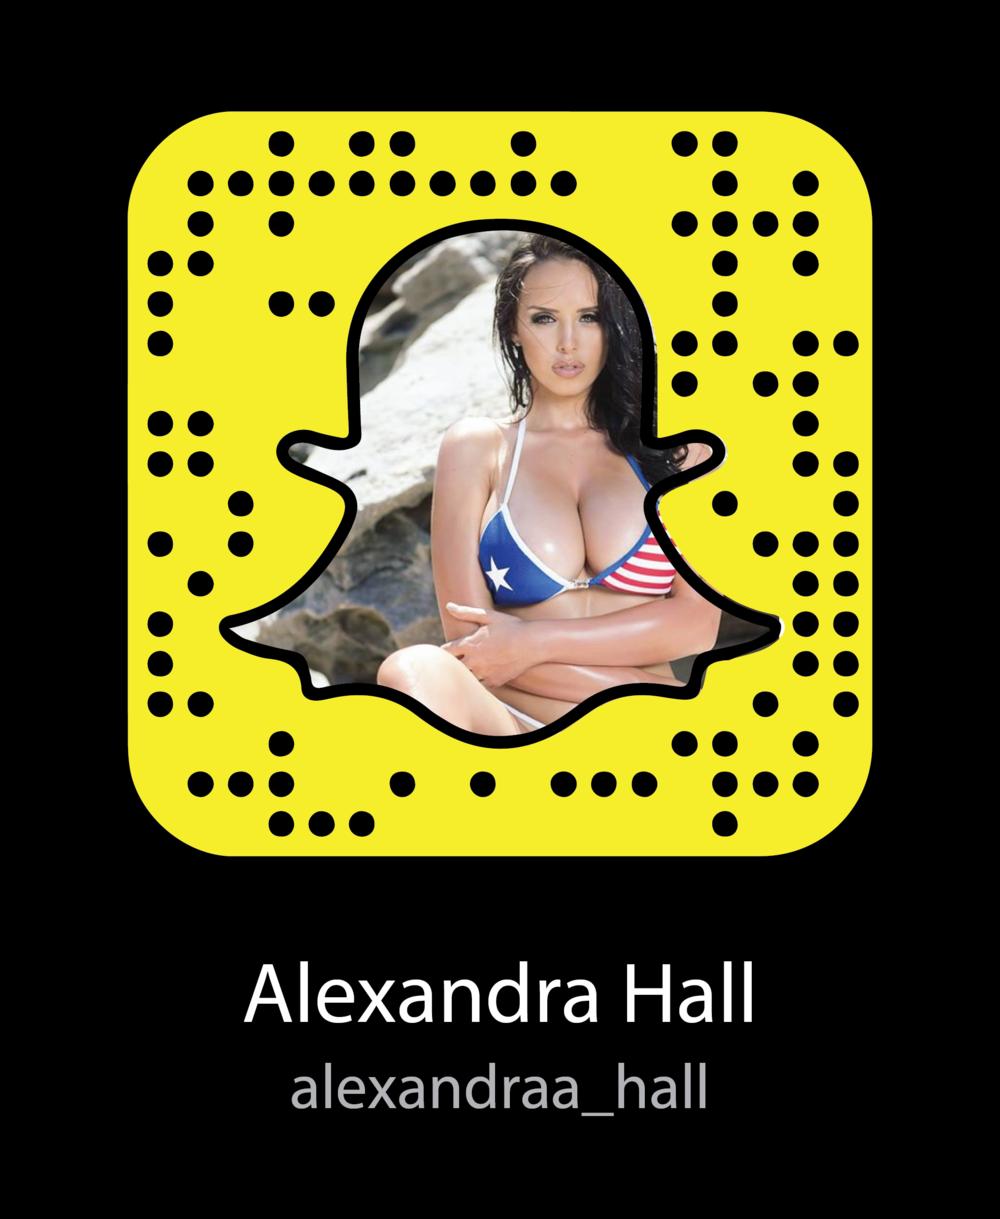 alexandraa_hall-Sexy-snapchat-snapcode.png